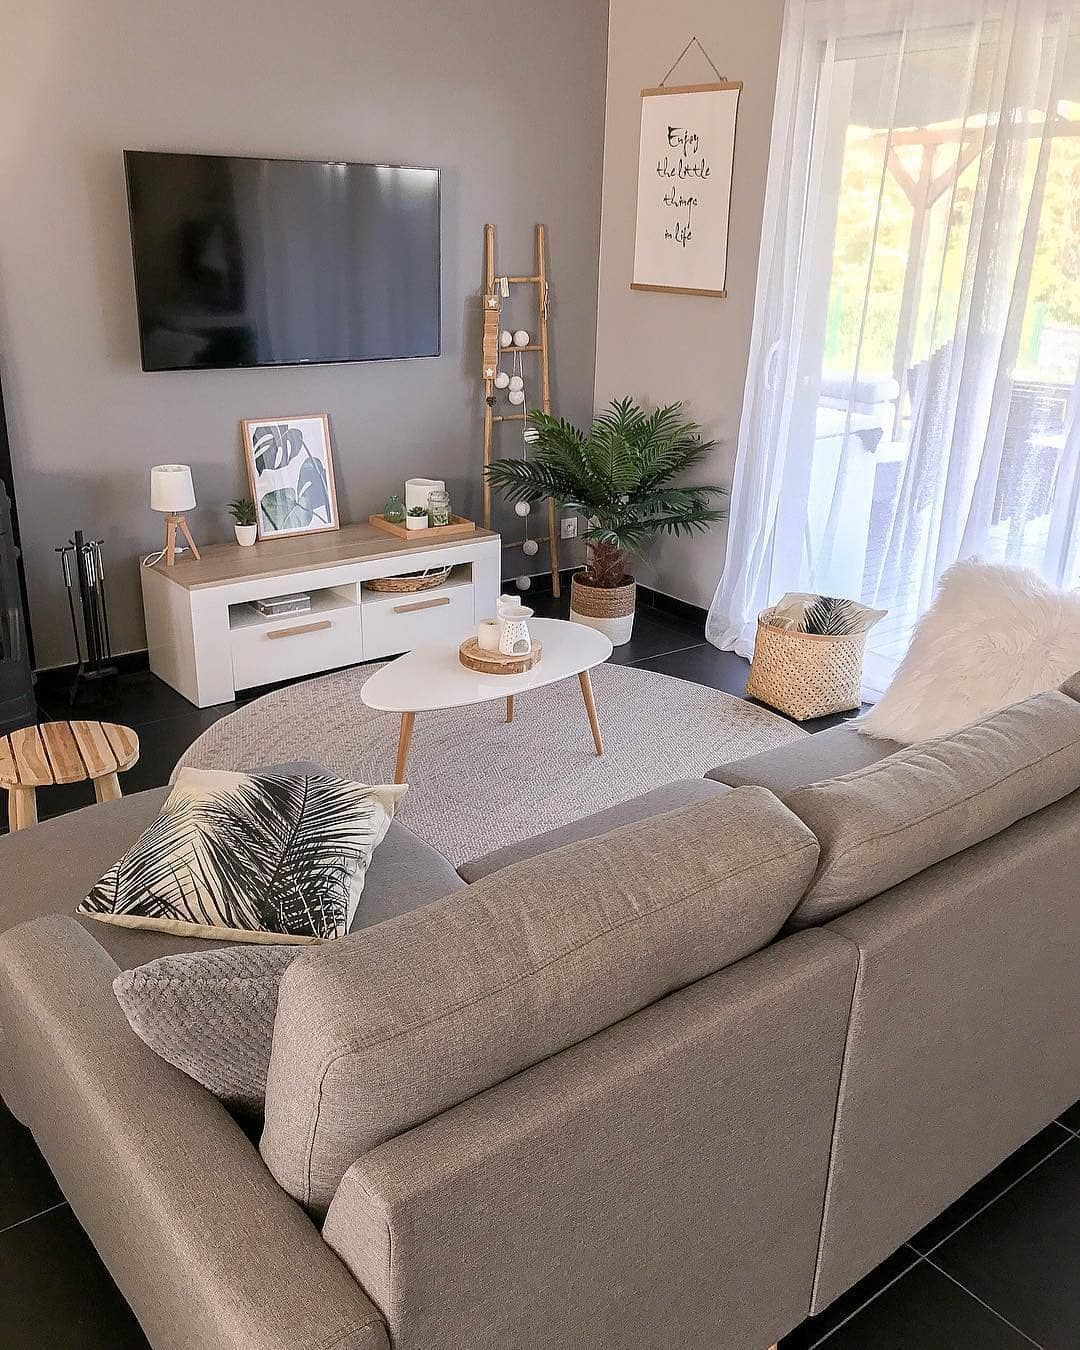 interiorinspirations #homestylebymeila #interiordesign